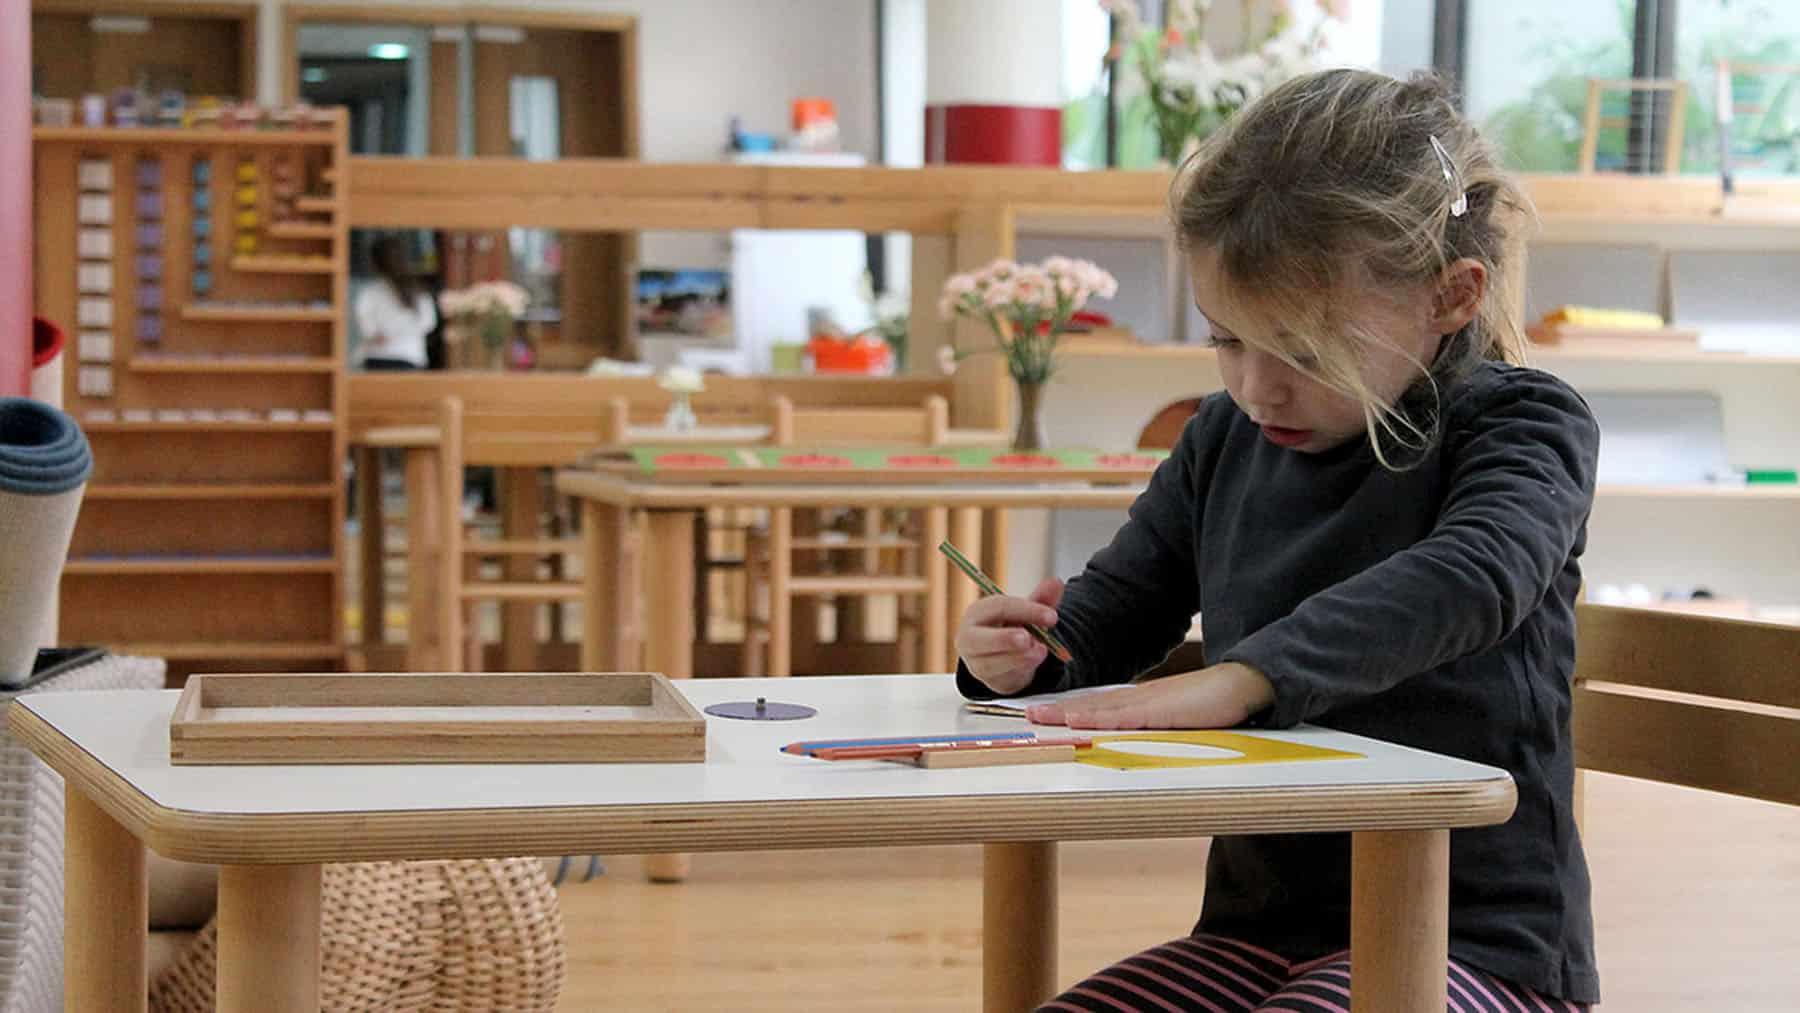 Teia Education Montessori Materials - Montessori school